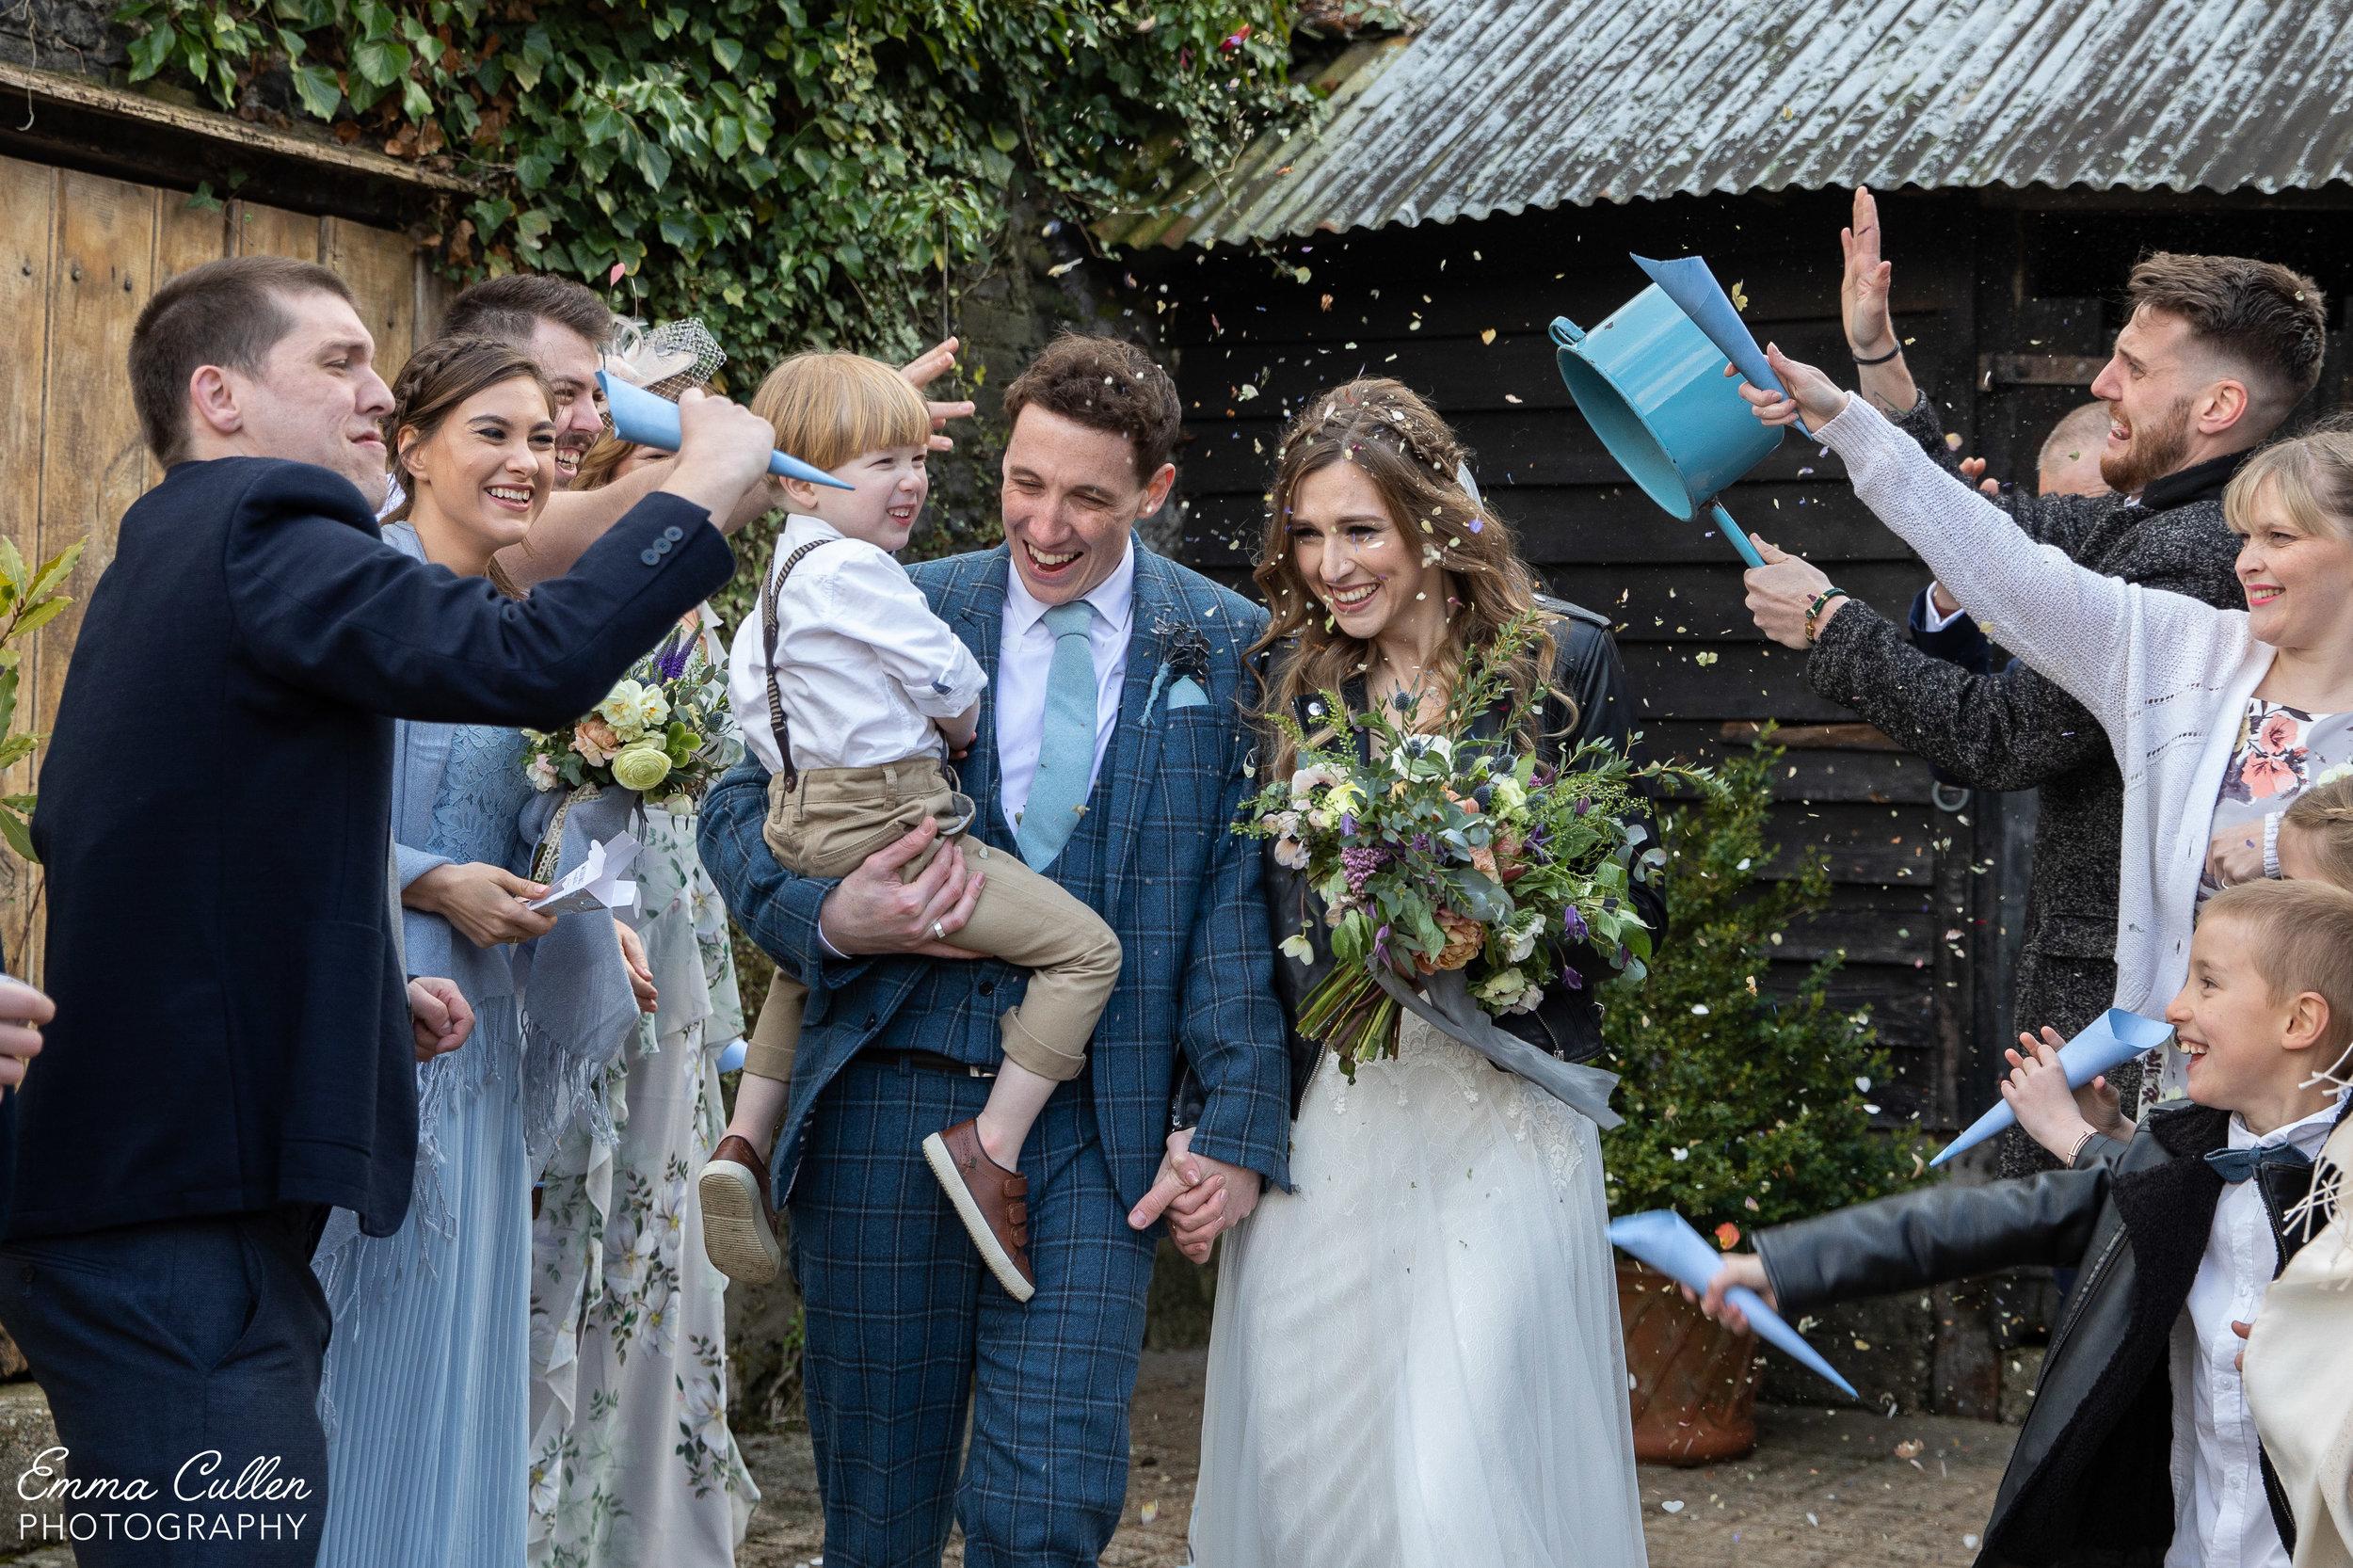 SM; Dobinsteen Wedding 13.04.19-1.jpg